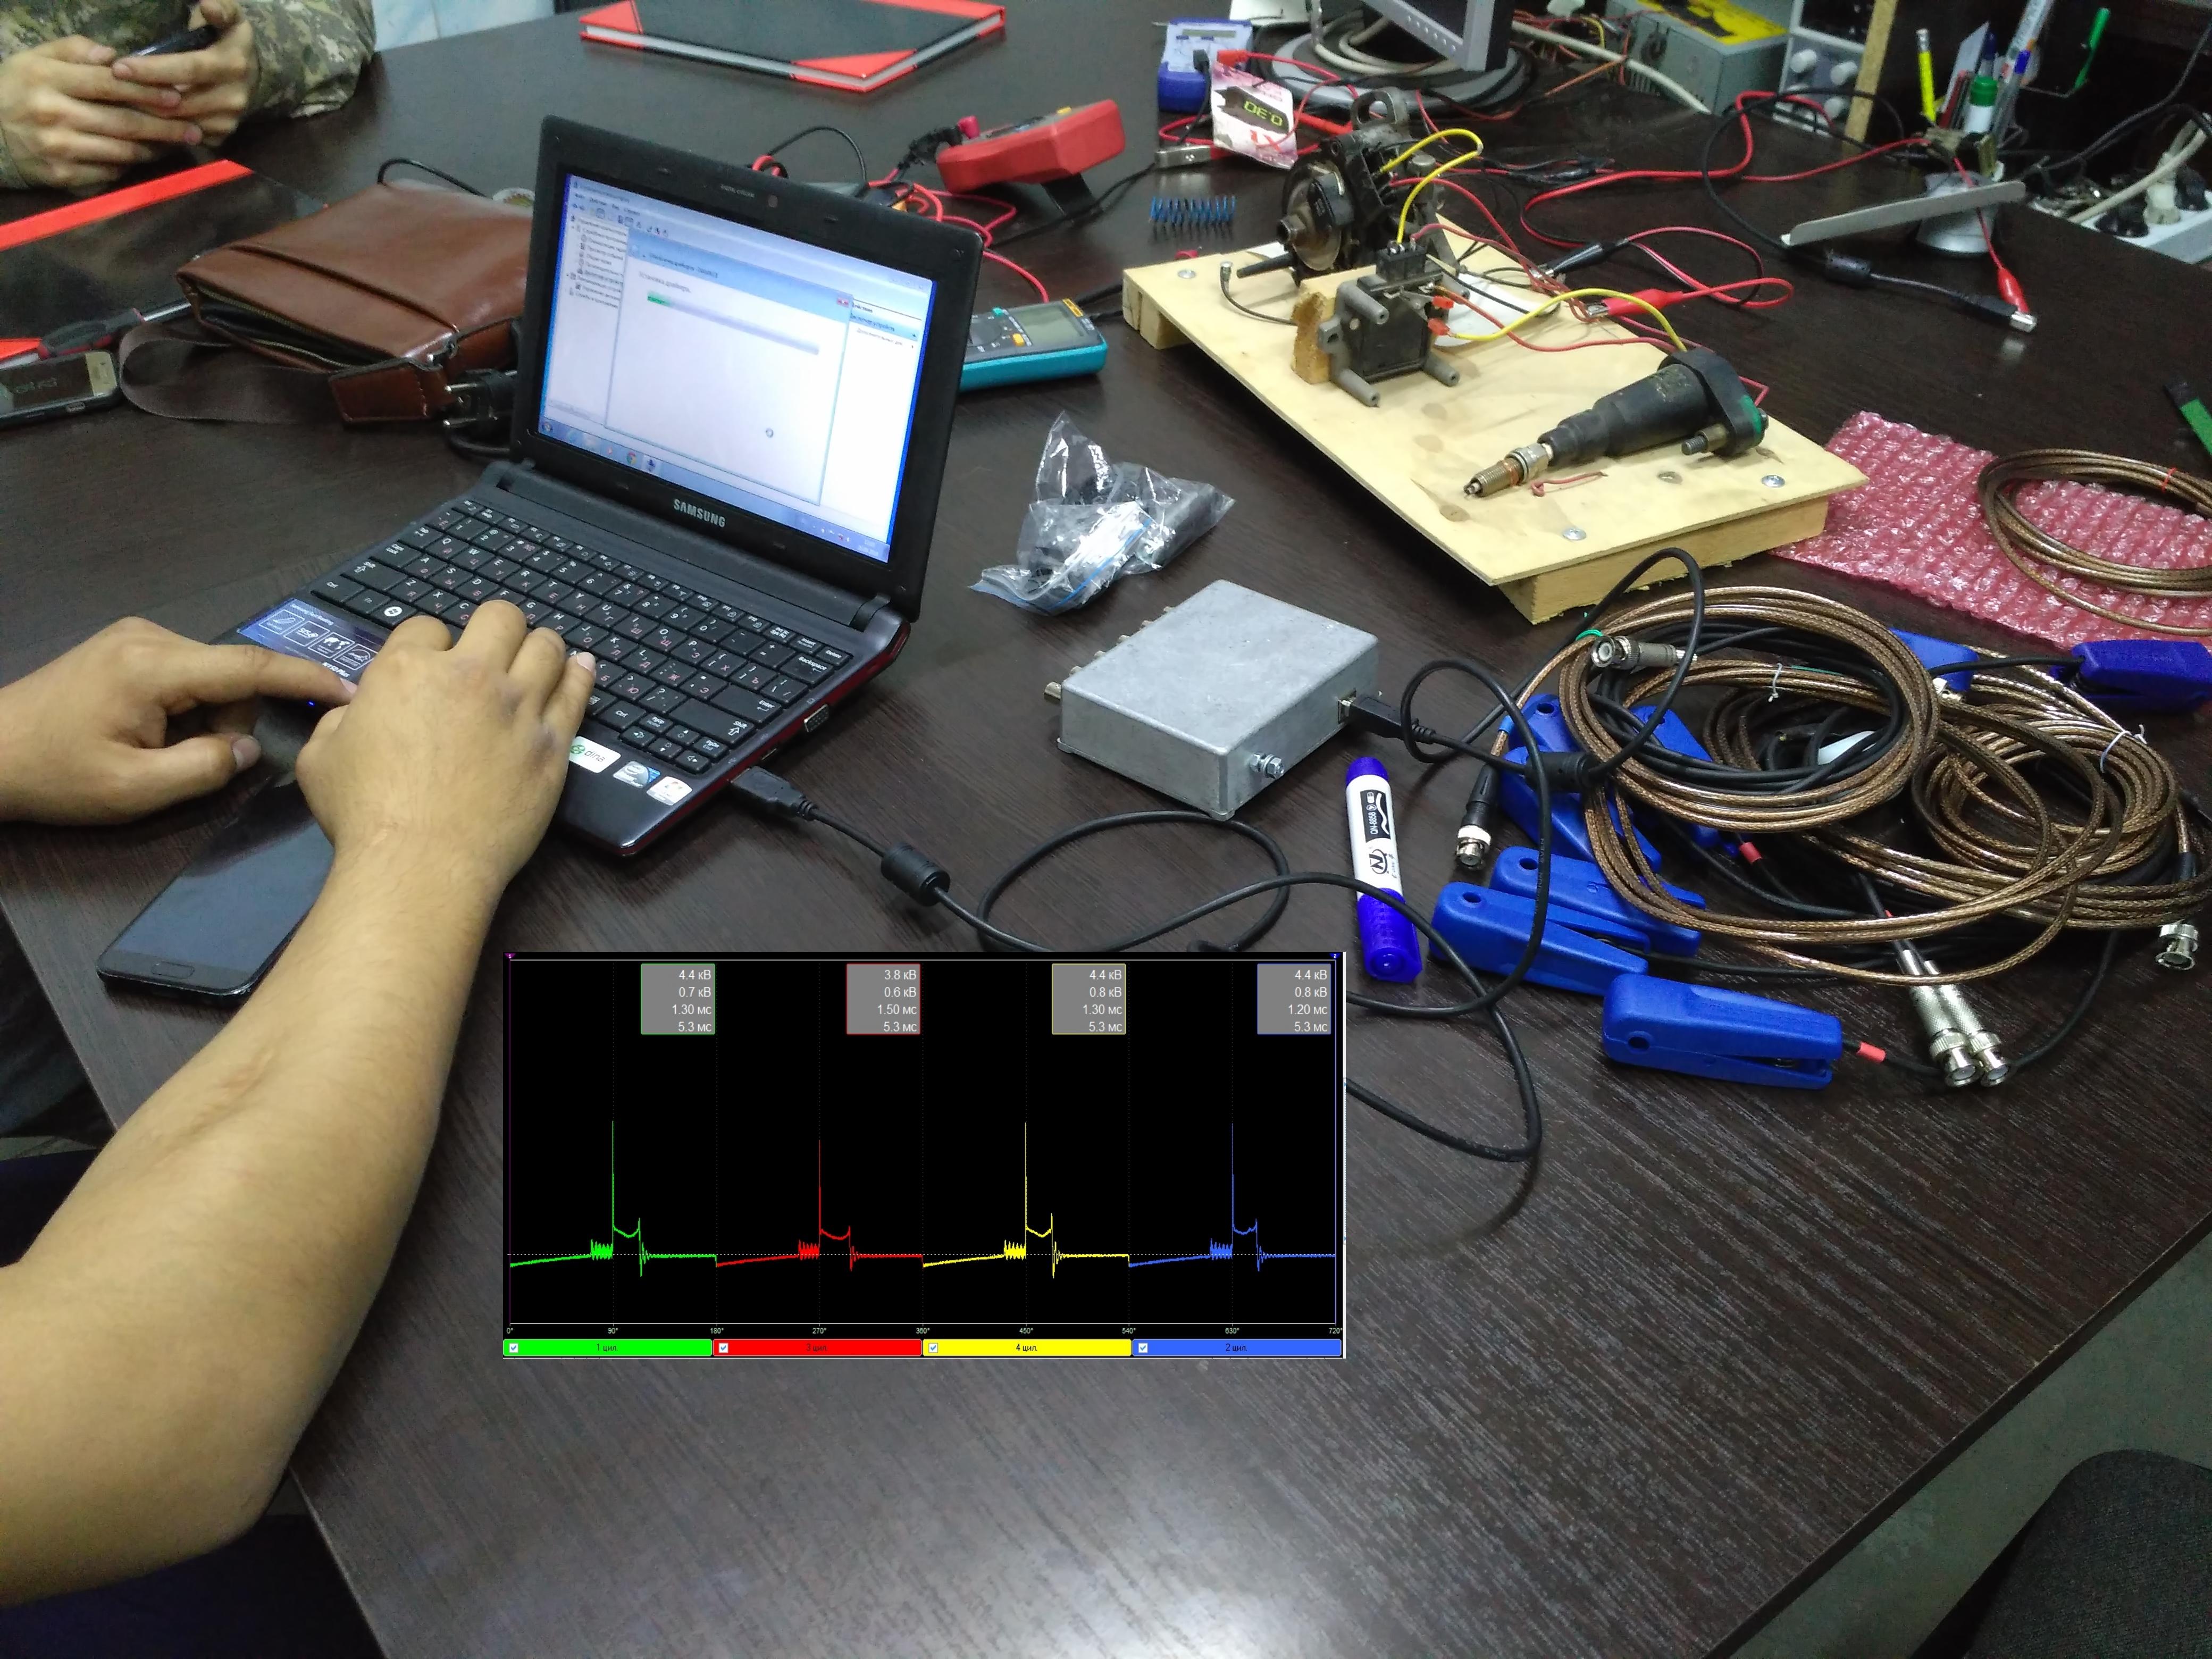 диагностика мотор-тестером